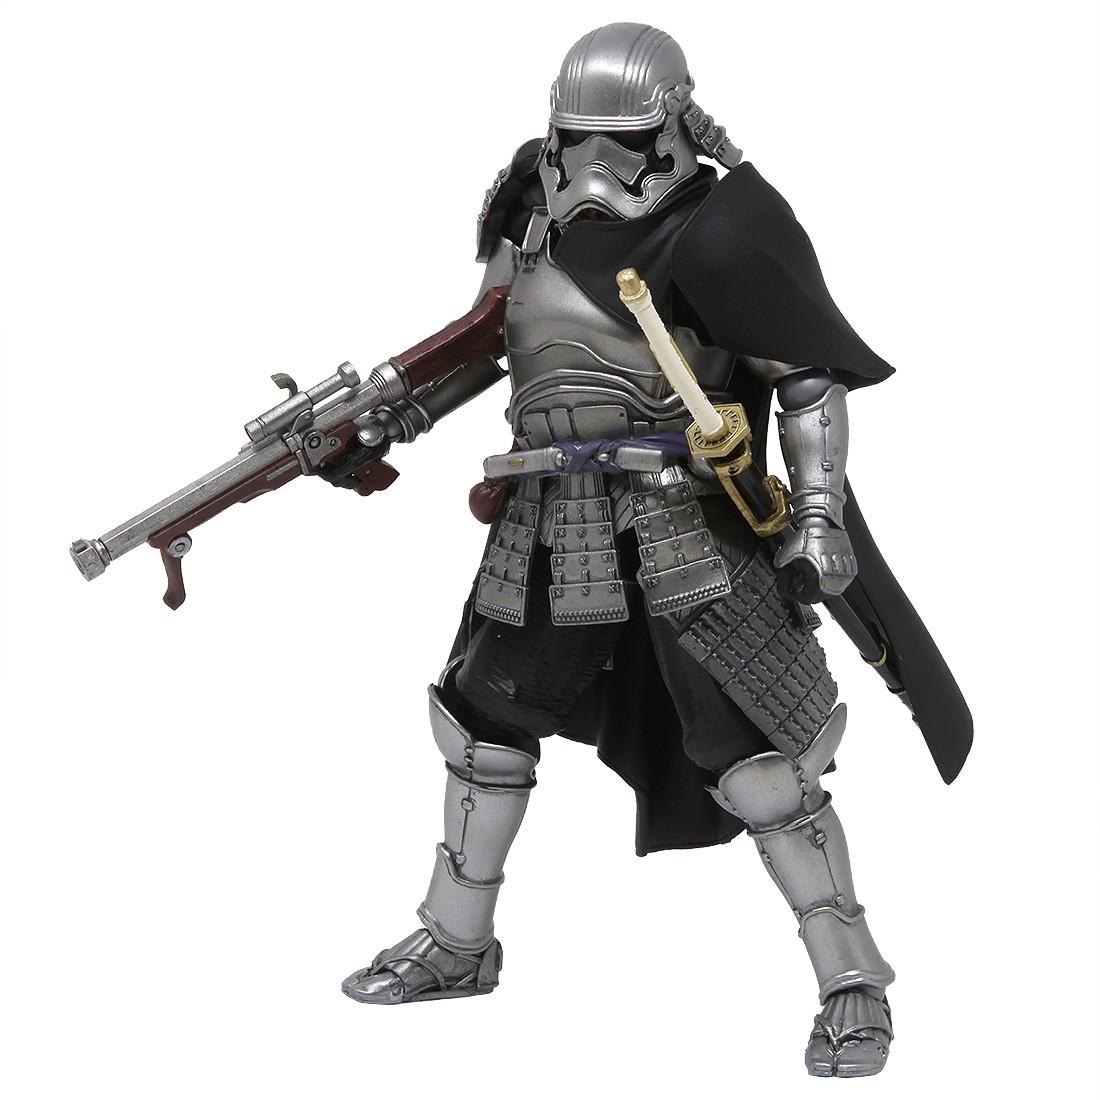 Bandai Mei Sho Movie Realization Star Wars Samurai General Stormtrooper Figure